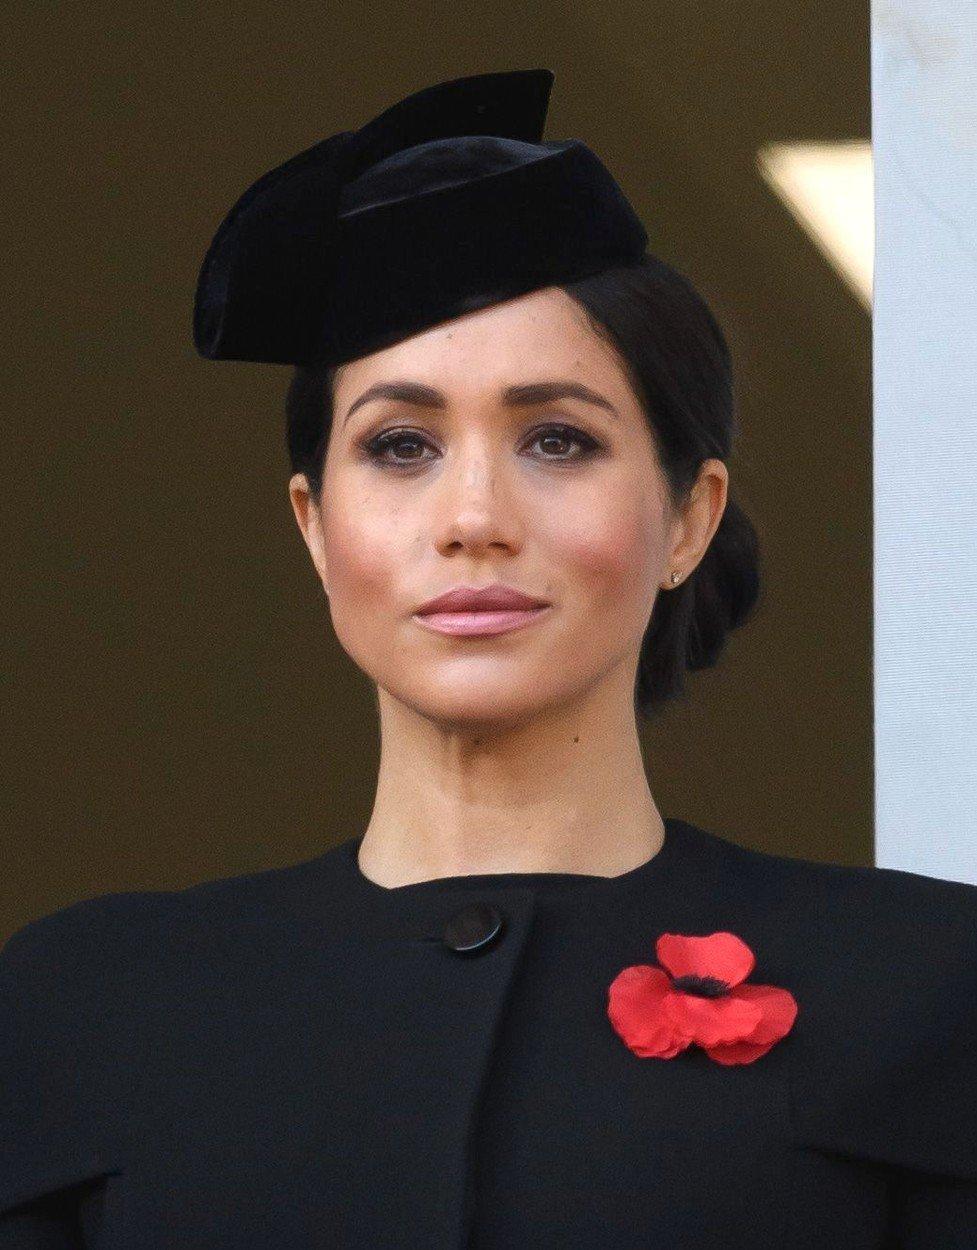 Vévodkyně Meghan